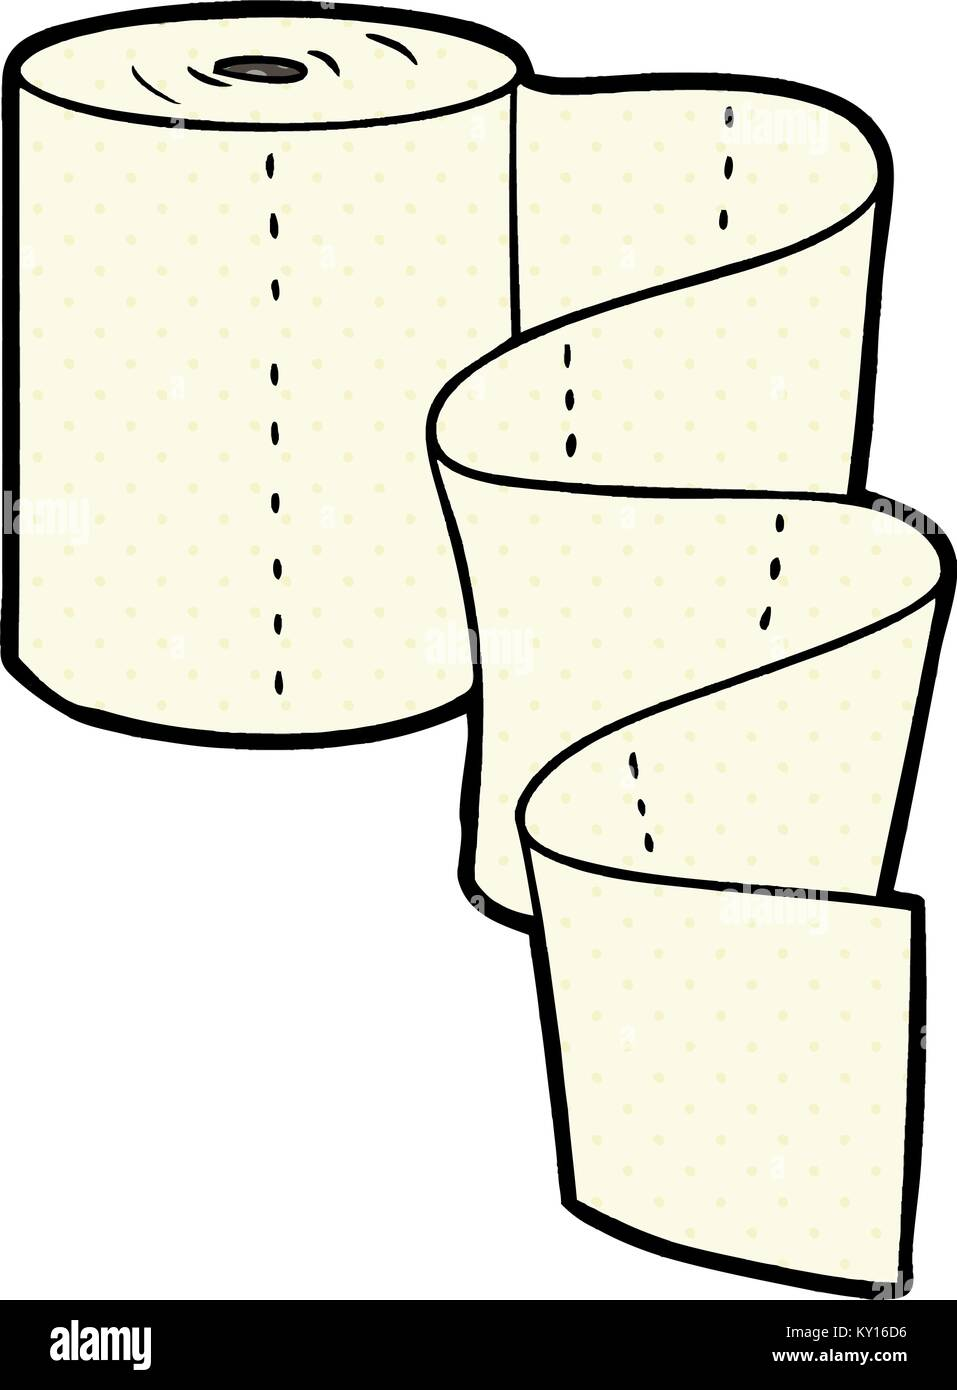 Cartoon Küche roll Vektor Abbildung - Bild: 171516050 - Alamy